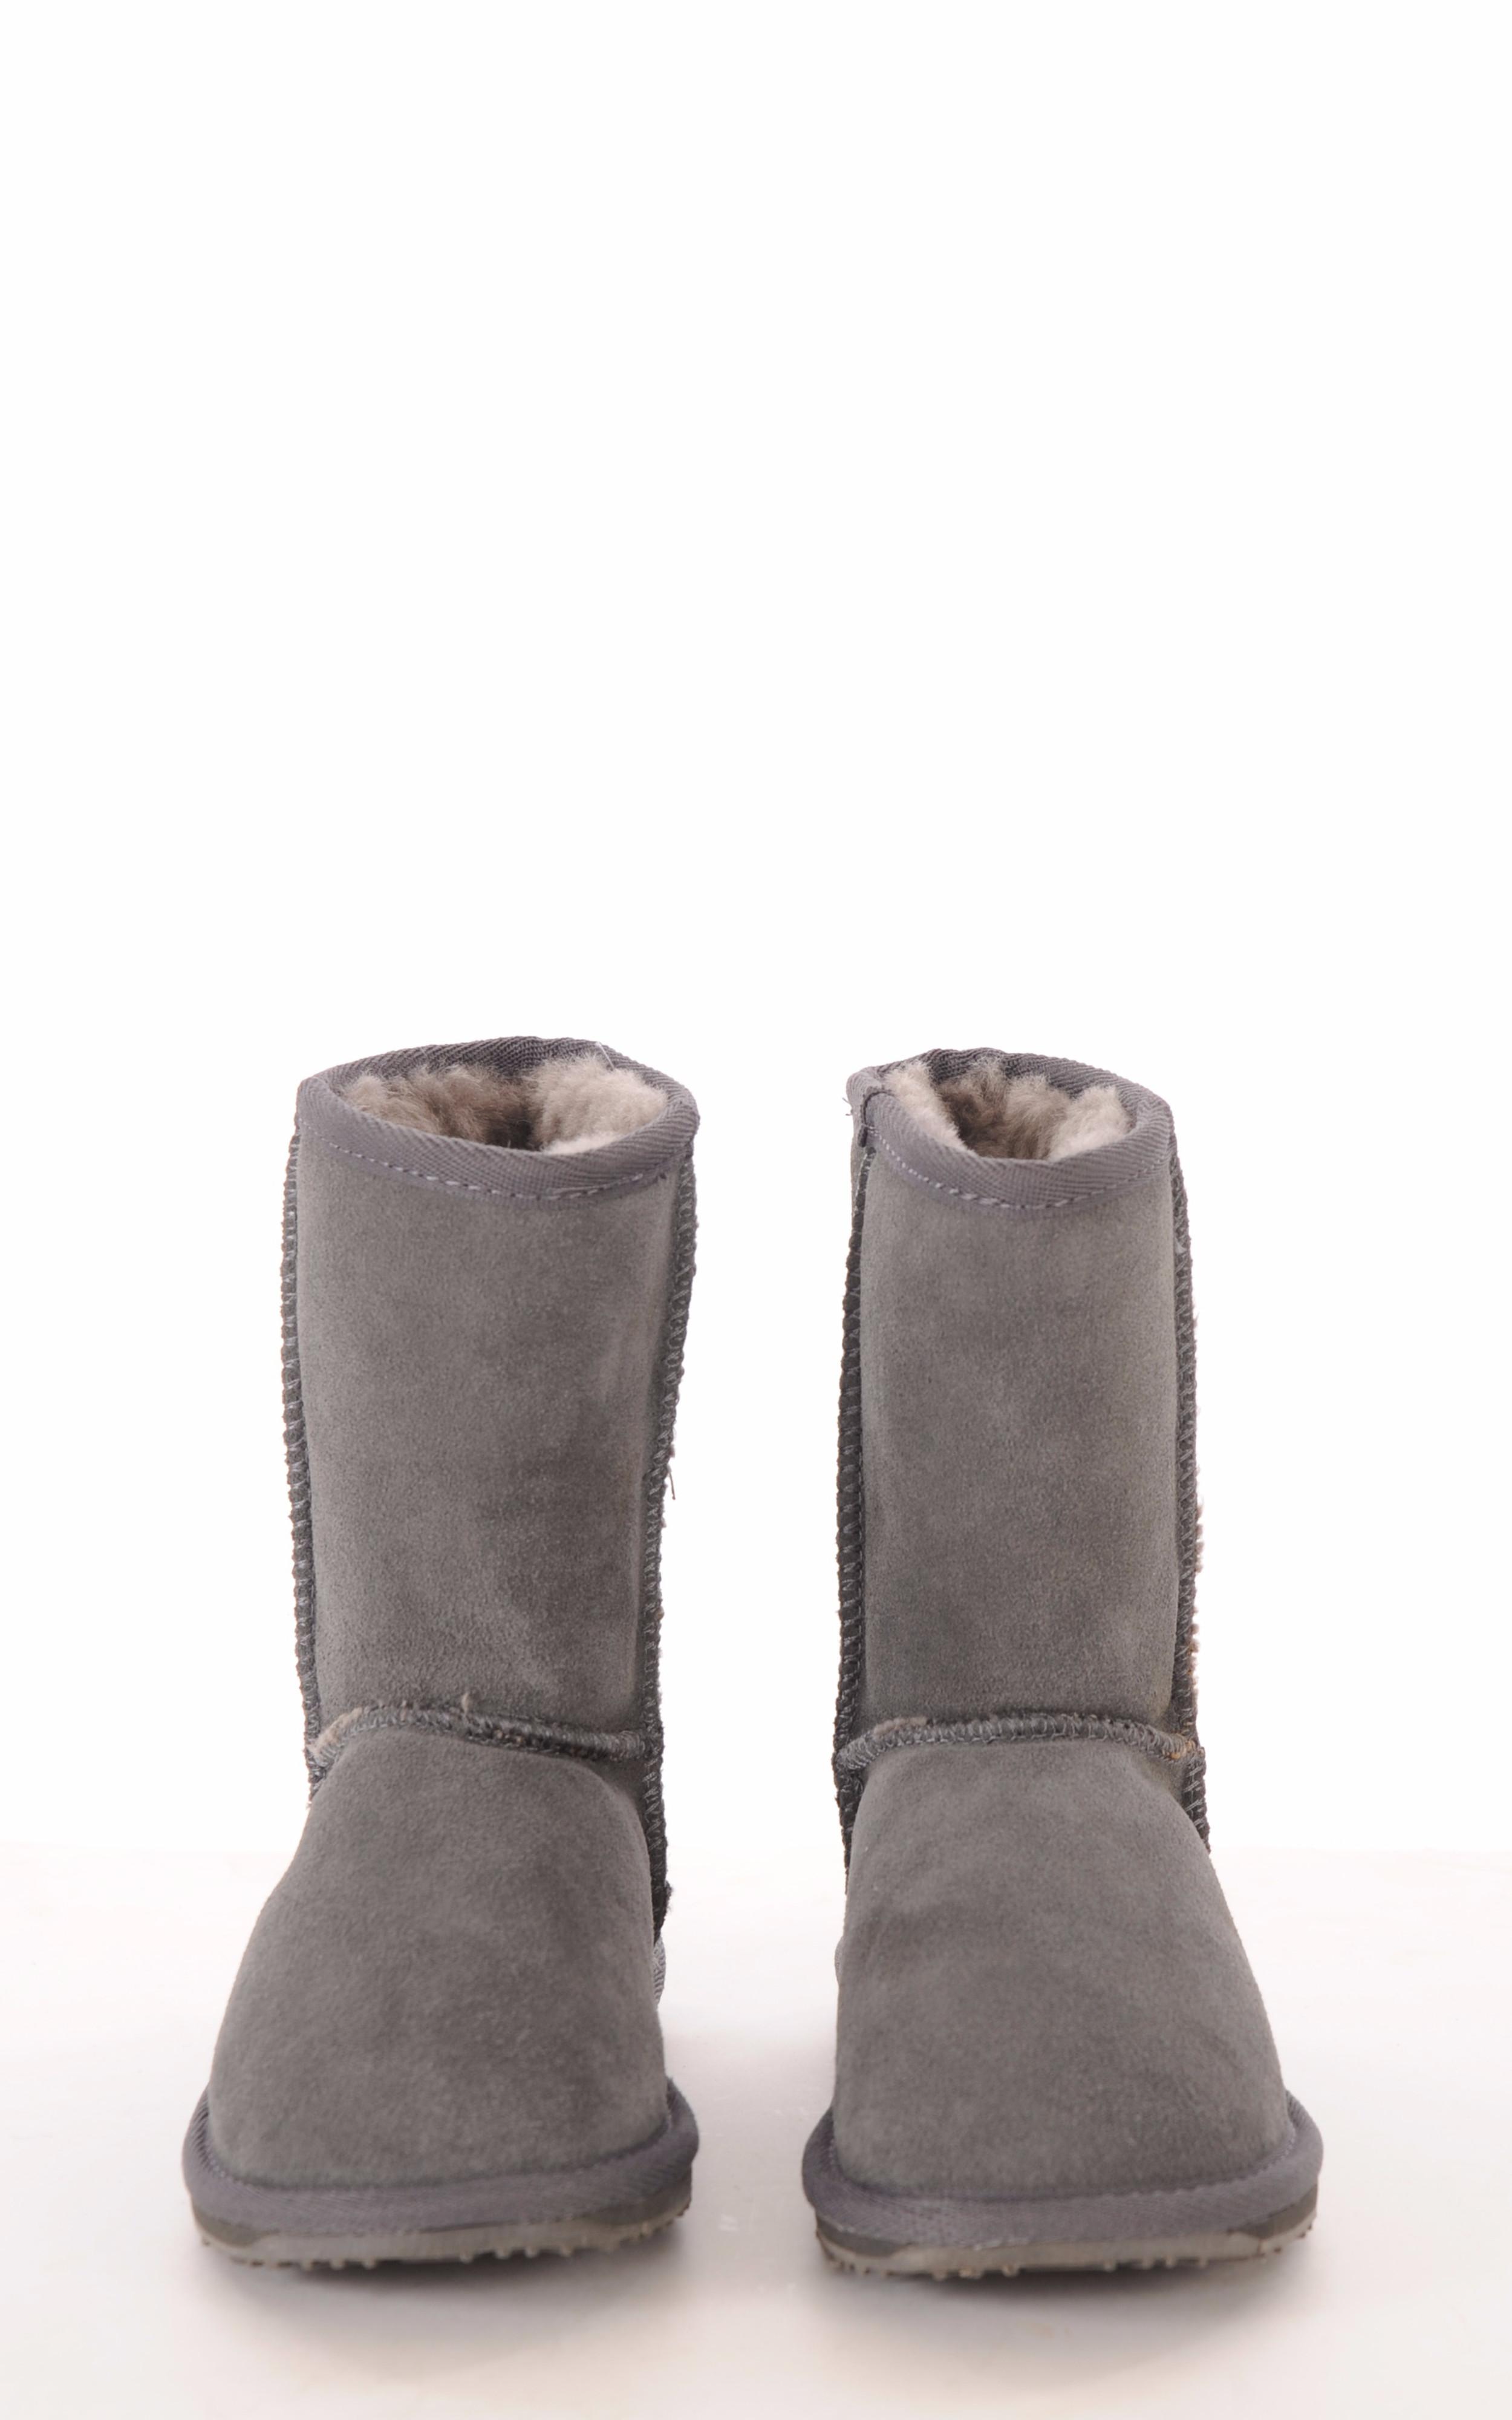 Boots Mérinos Enfant Emu